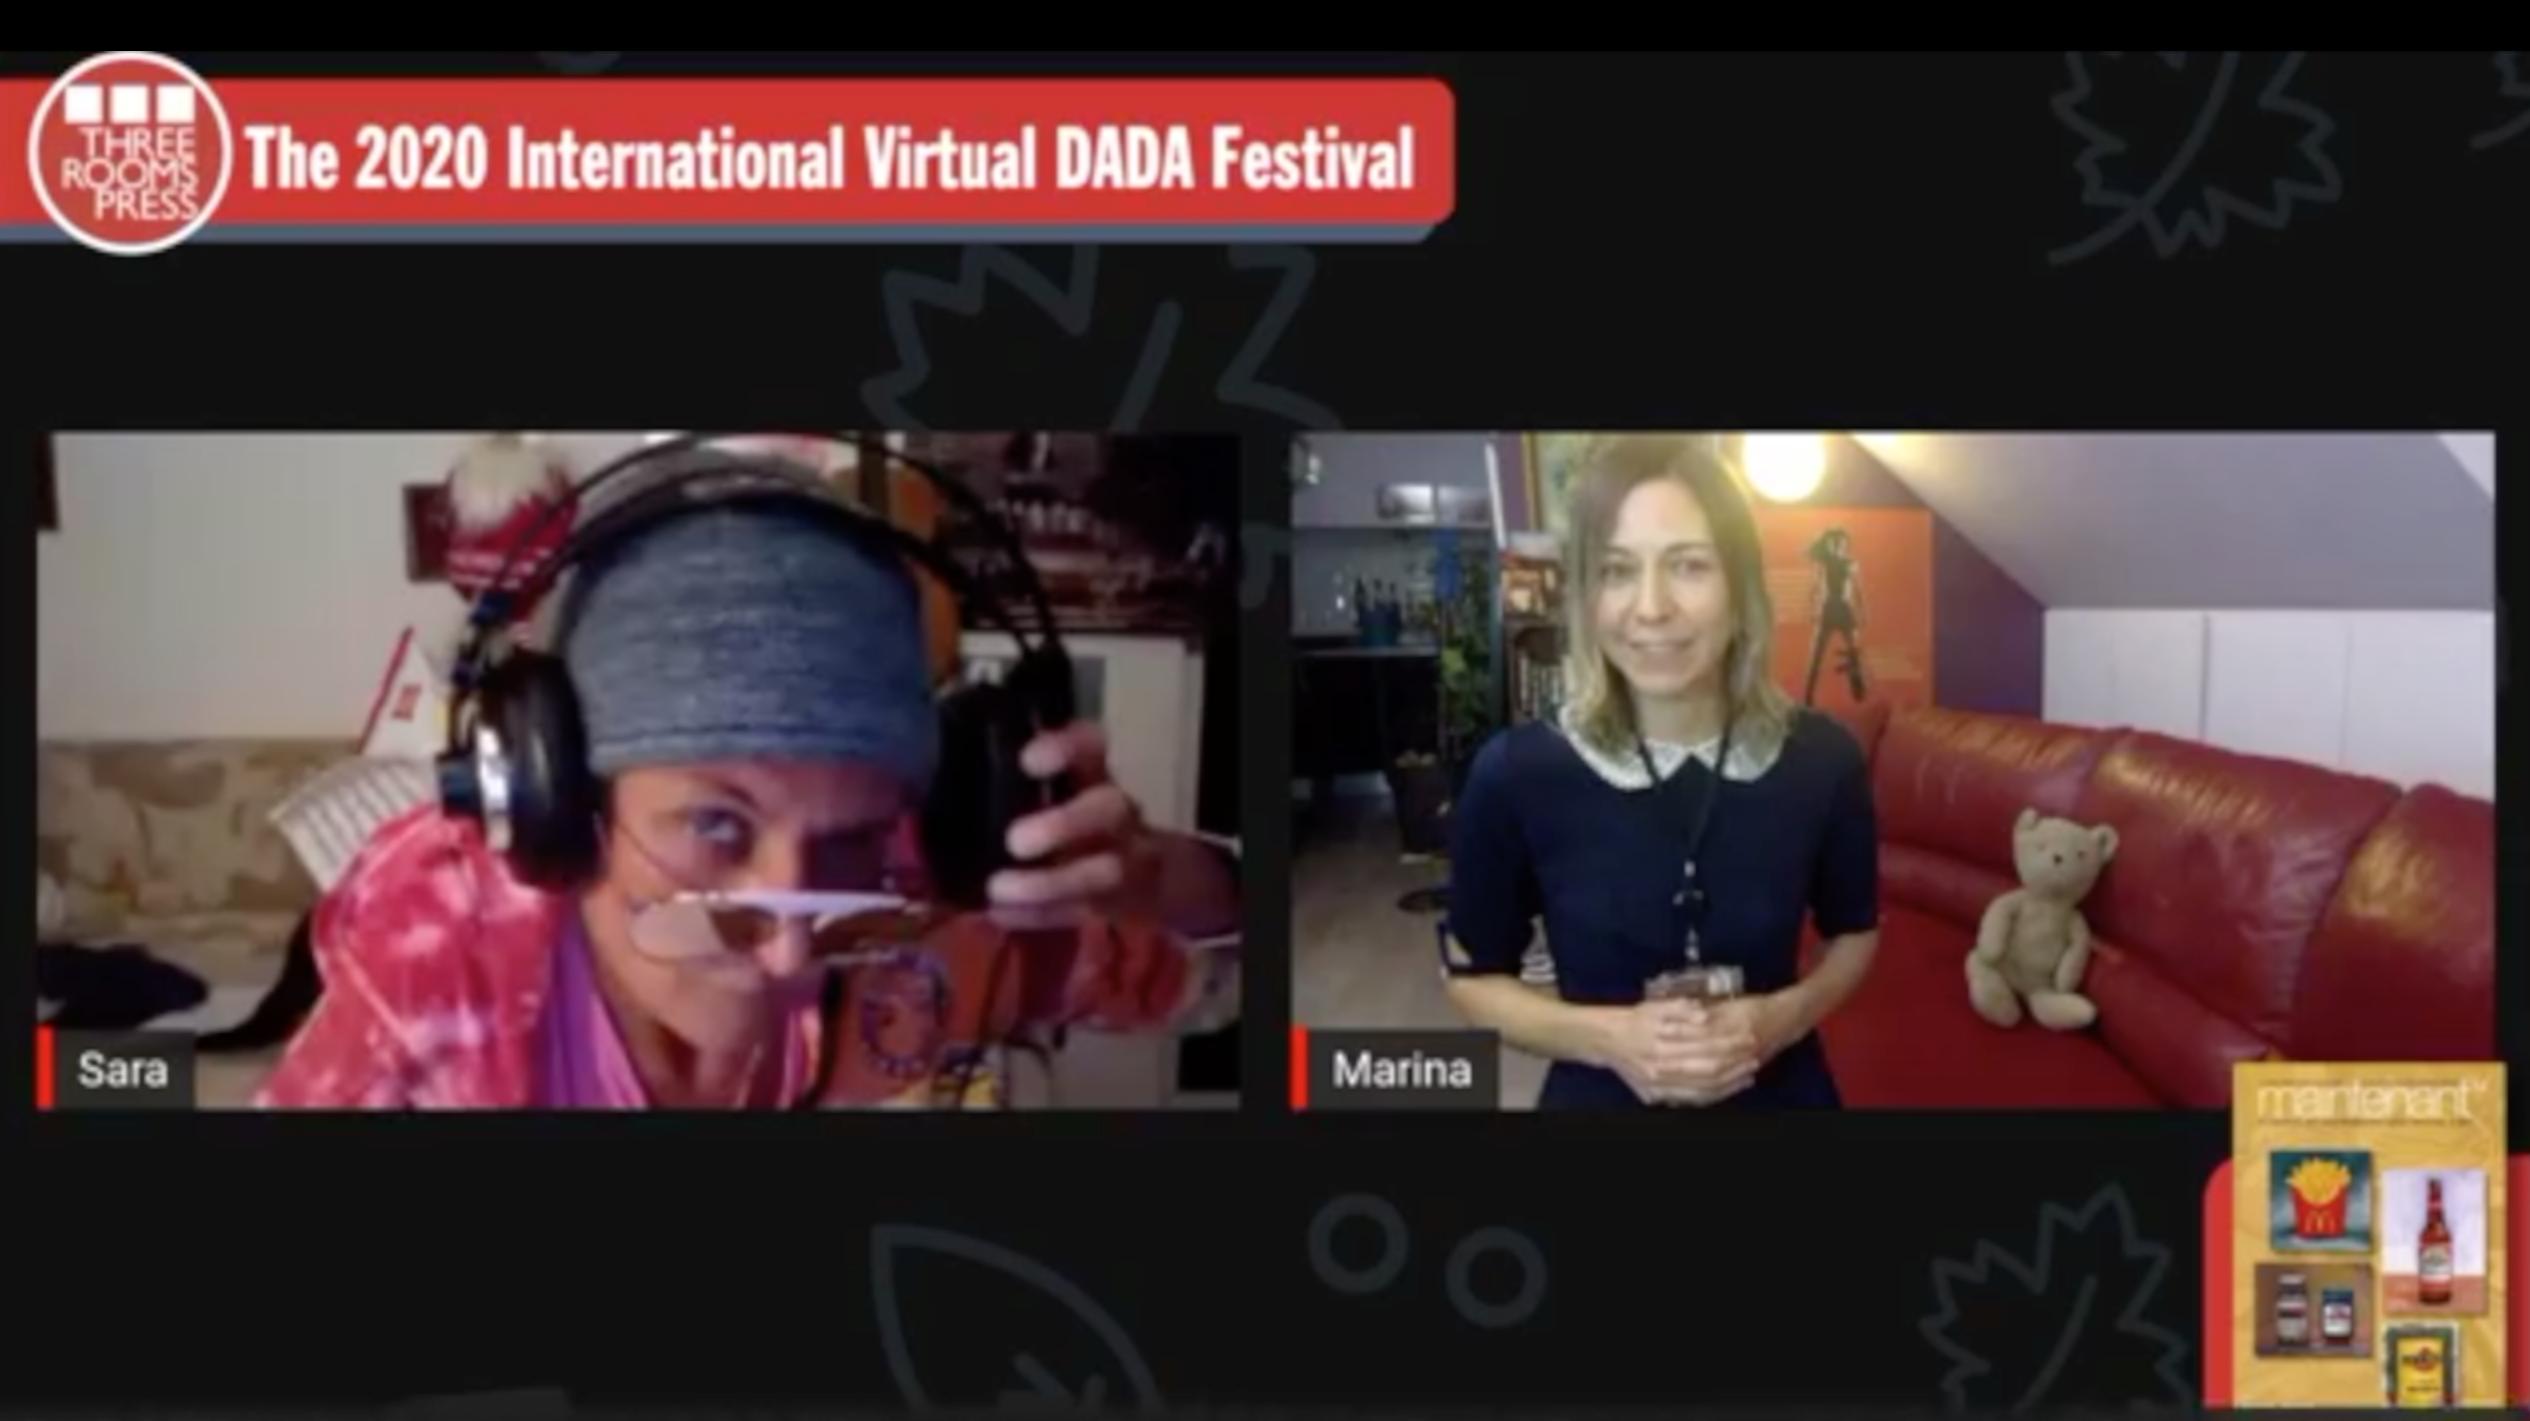 Sara Maino and Marina Kazakova perform at the 2020 International Virtual DADA Festival